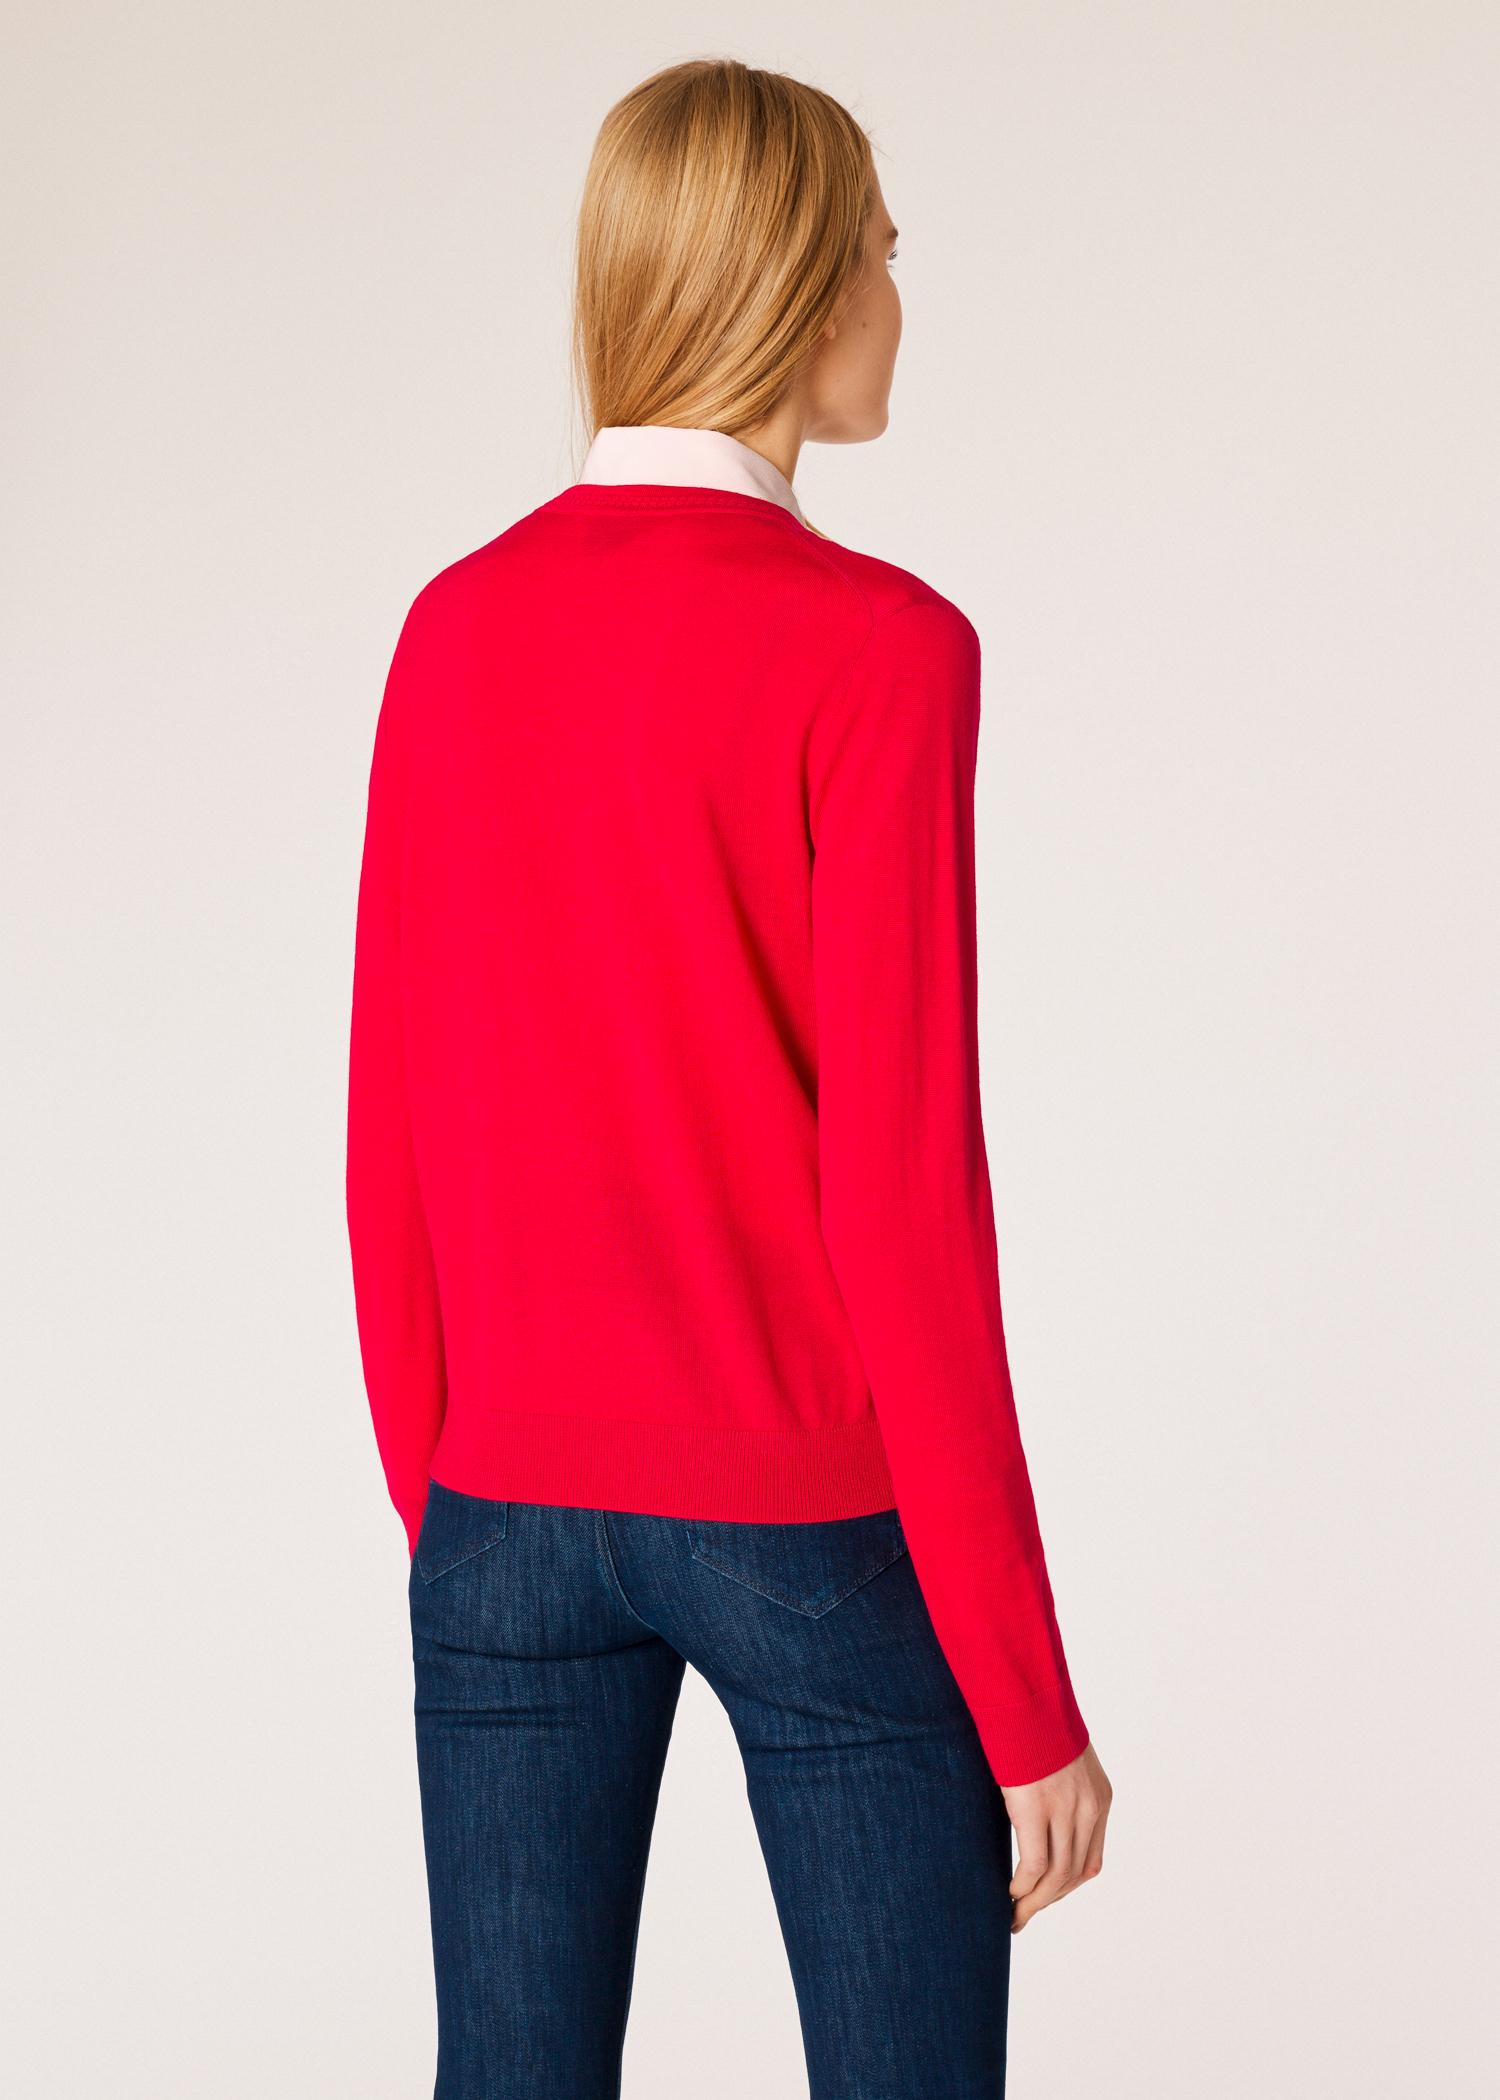 Vue mannequin dos zoom - Pull Femme Rouge Col V Contrastant En Laine Paul  Smith dba7e68b3e8